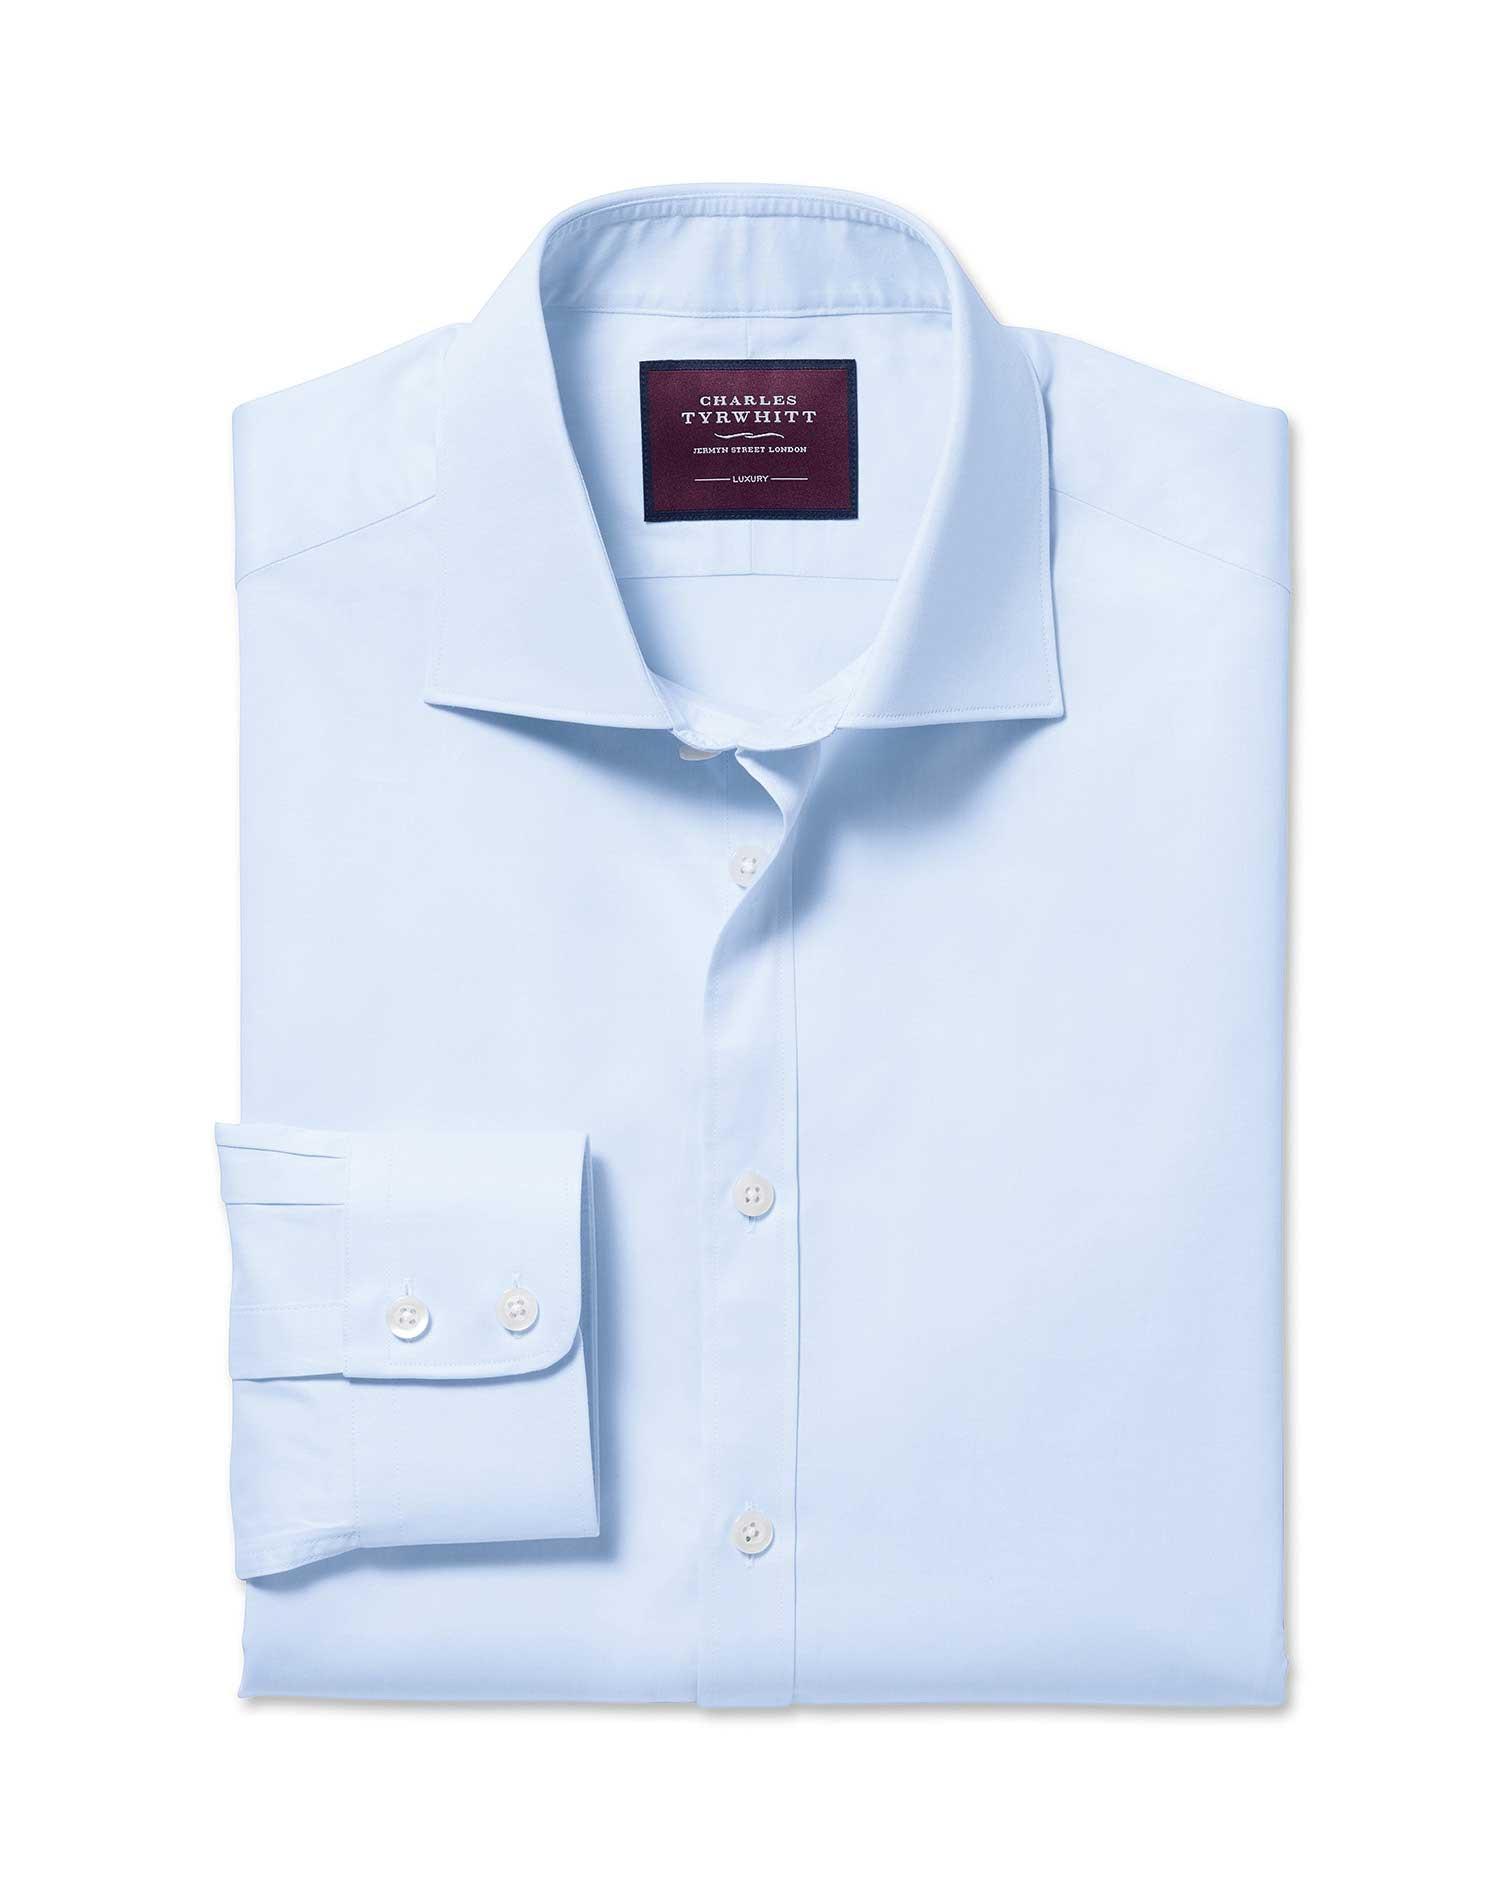 Slim Fit Semi-Cutaway Luxury Twill Light Blue Egyptian Cotton Formal Shirt Double Cuff Size 16/34 by